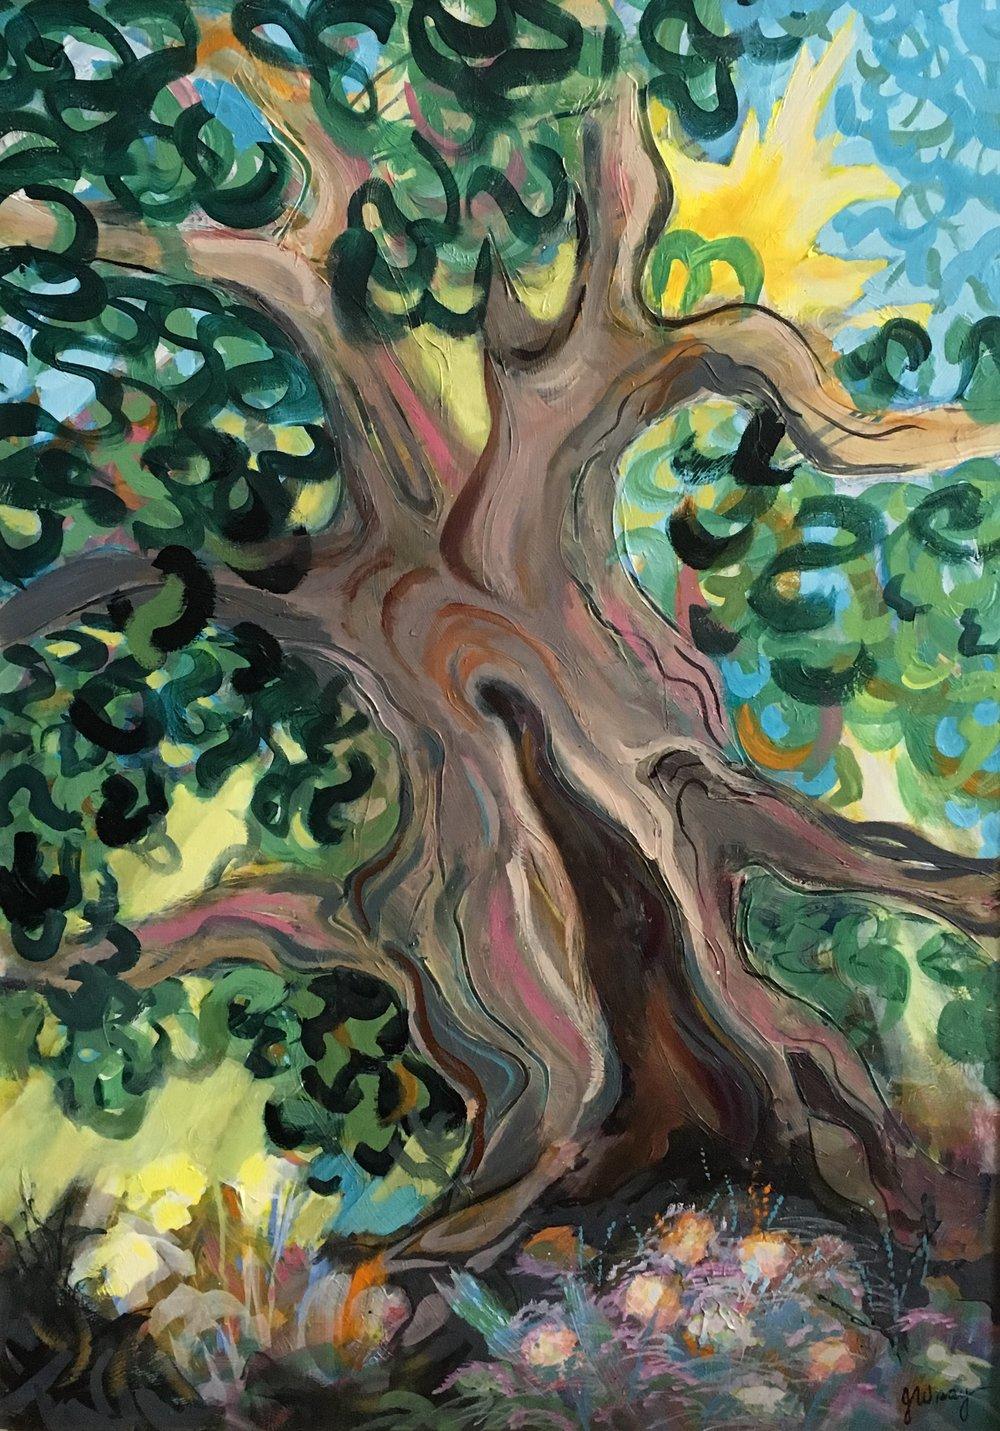 """Oak Tree"" by Jerry Wray"